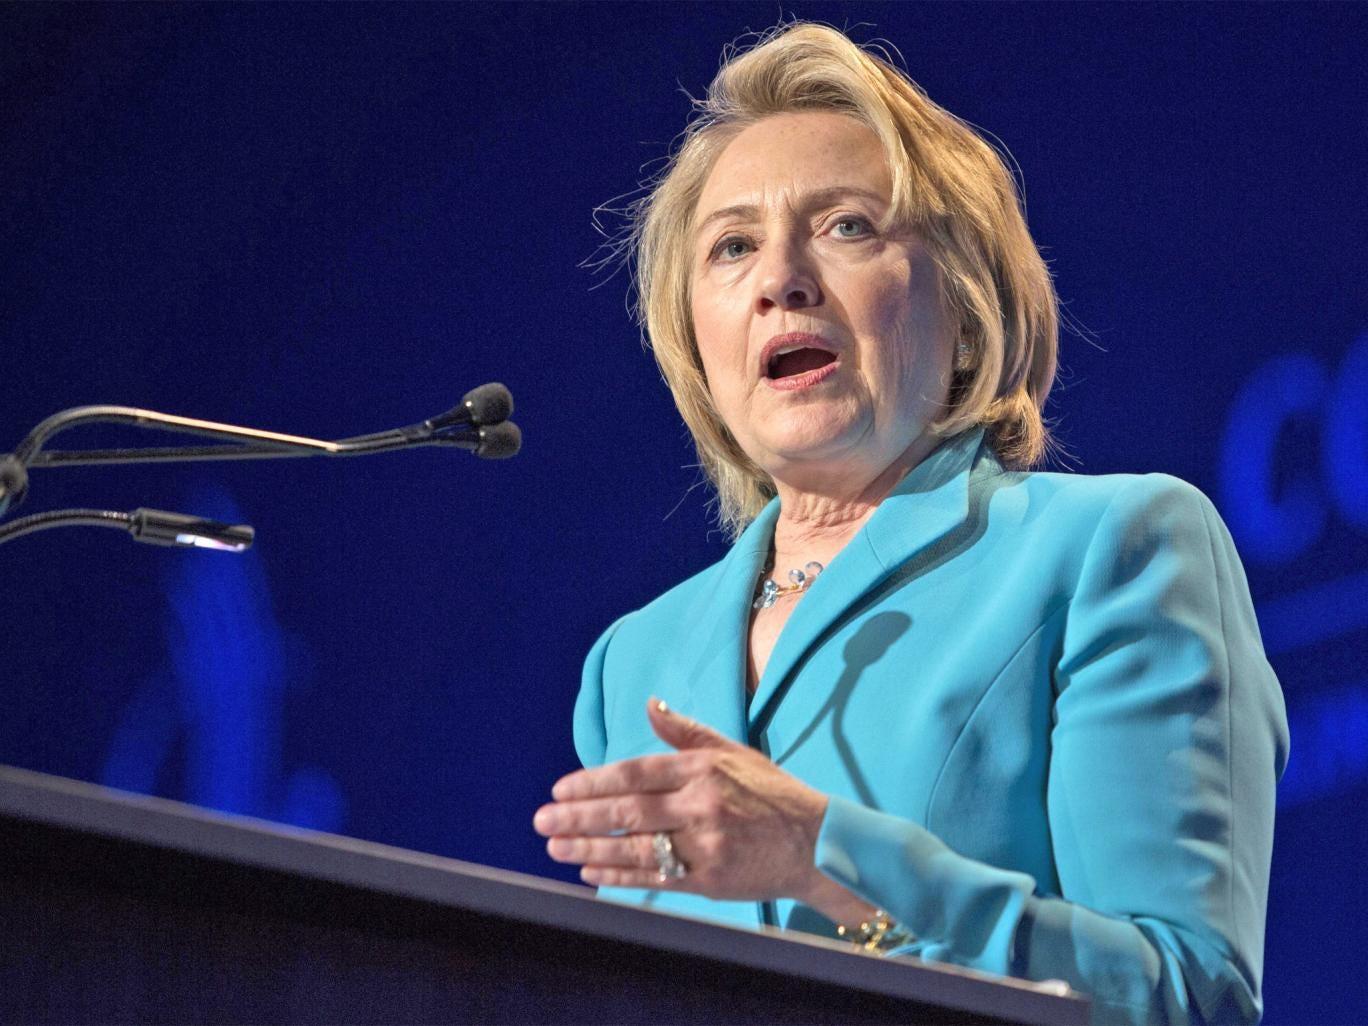 Former US Secretary of State, Hillary Clinton